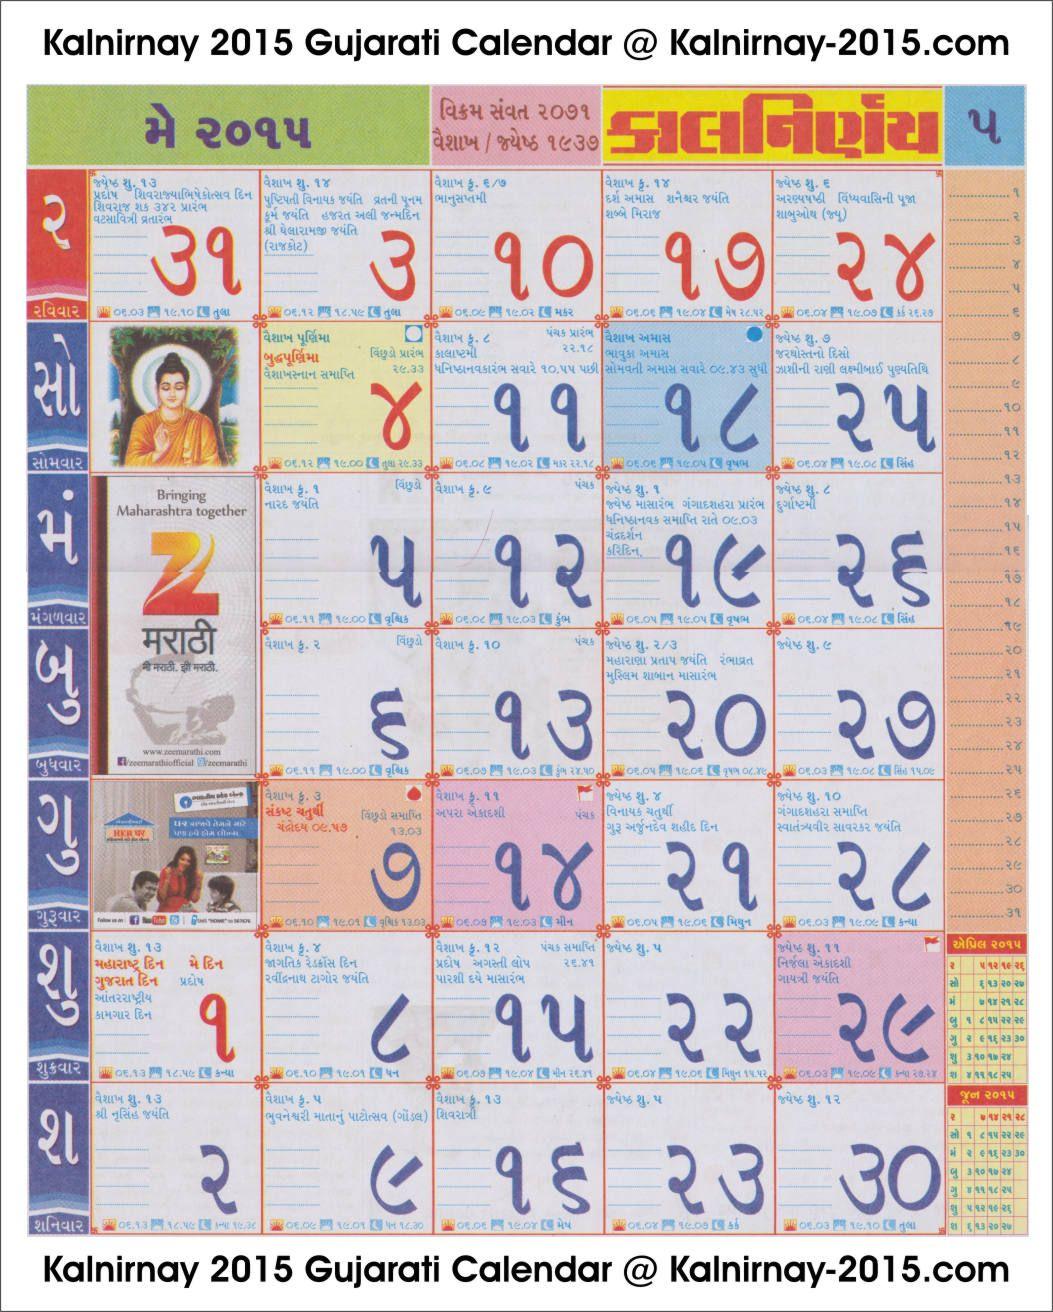 May 2015 Gujarati Kalnirnay Calendar | 2015 Kalnirnay with Gujarati Month Calendar